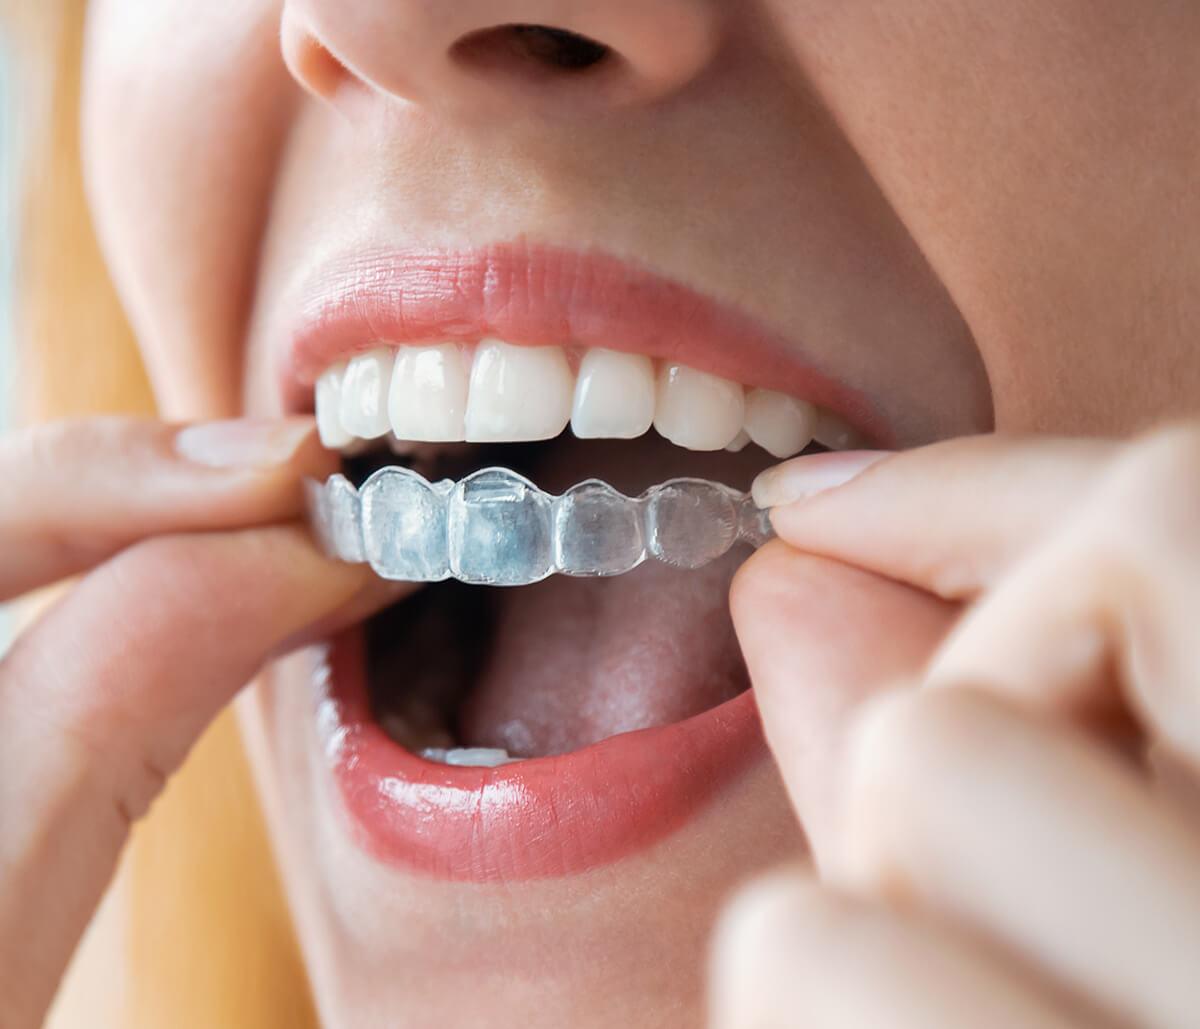 Invisible Teeth Aligners at Nashua Cosmetic & Restorative Dentistry in Nashua NH Area